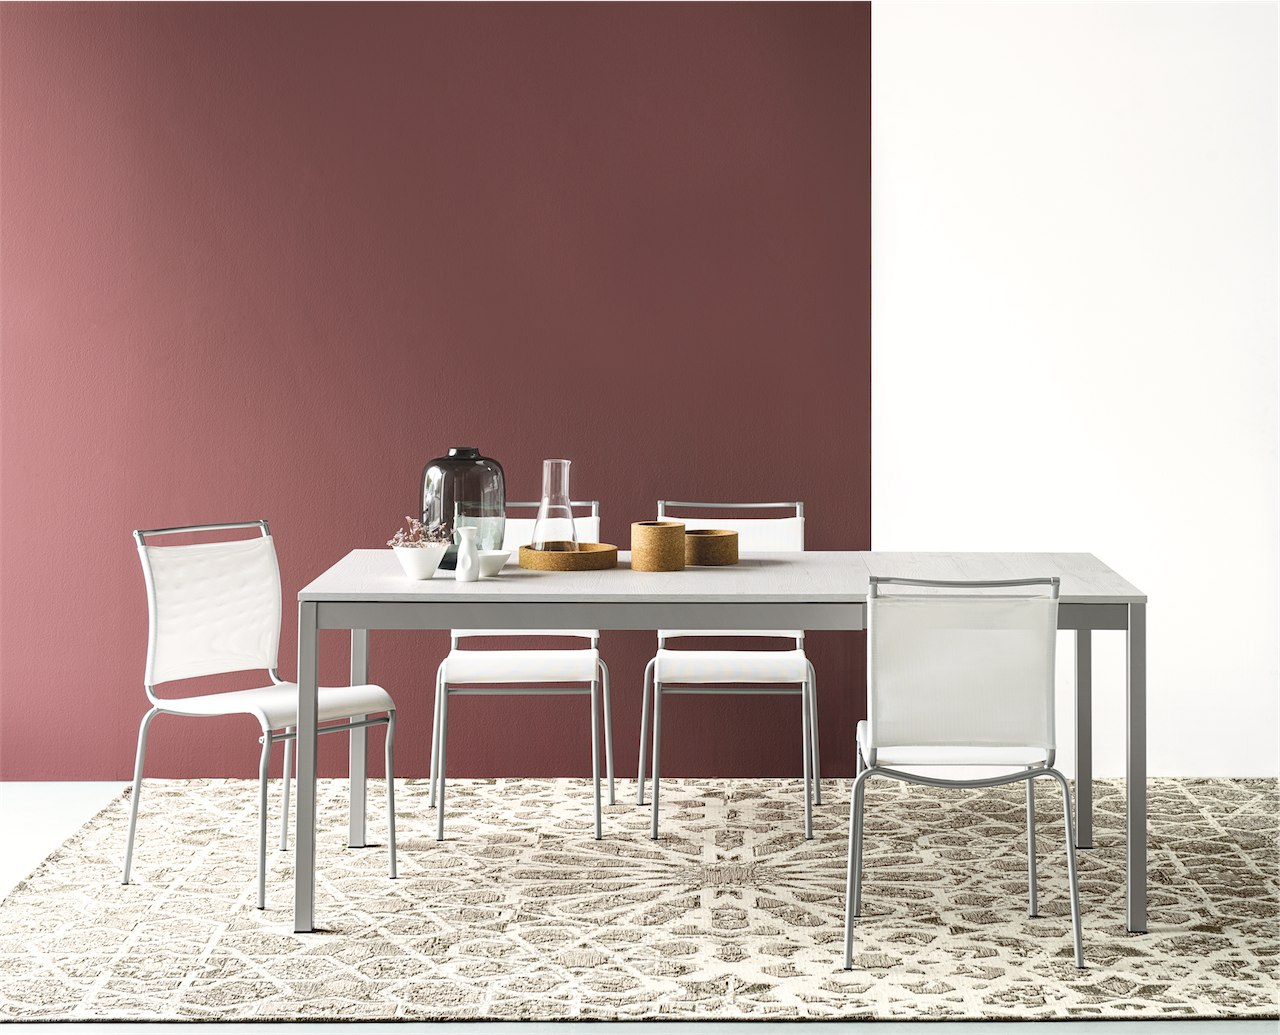 Sedia air connubia by calligaris linea tavoli e sedie